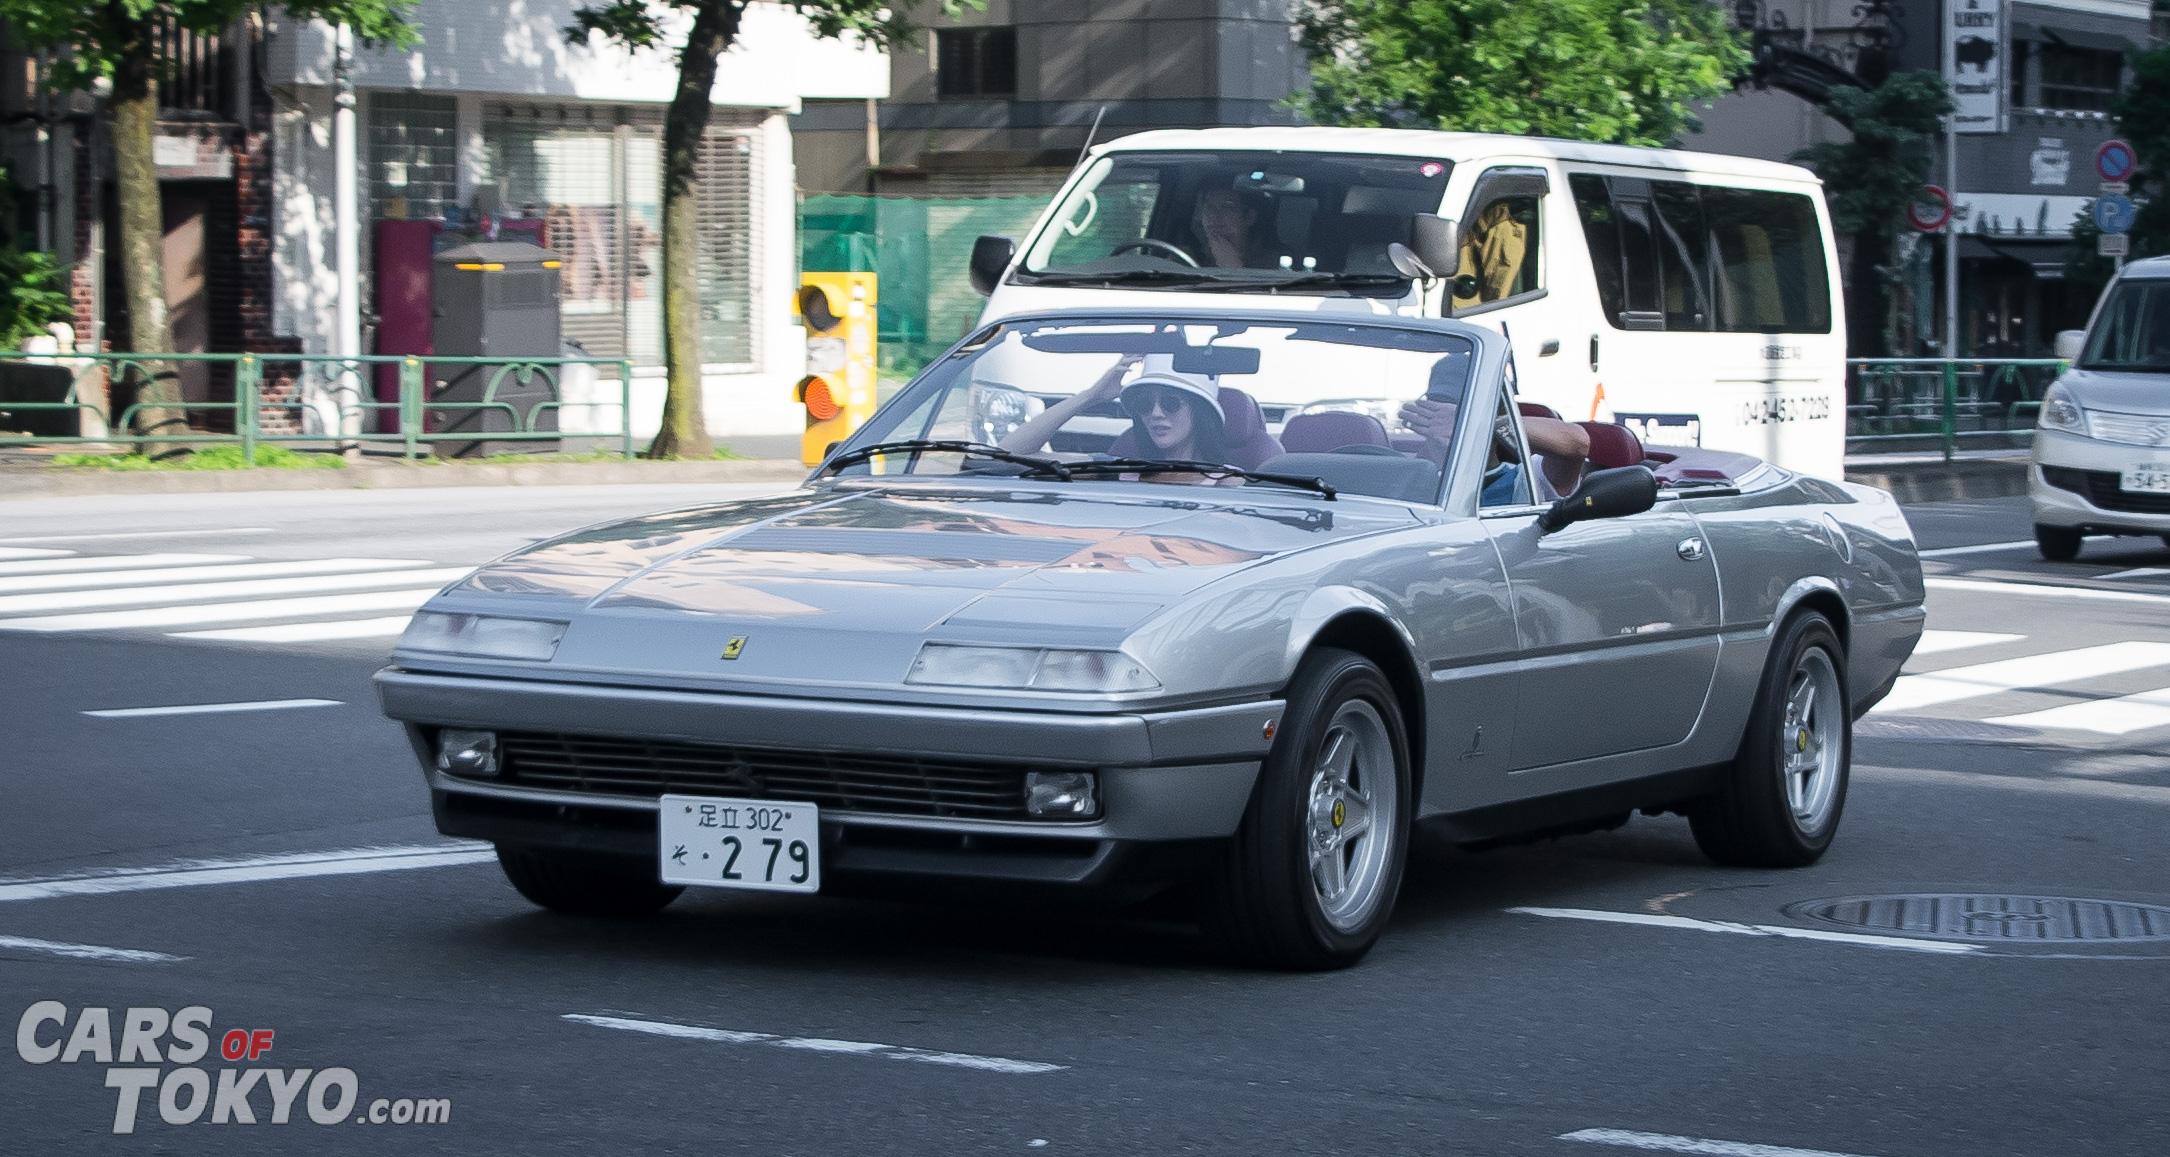 Cars of Tokyo Classic Ferrari 412 Convertible